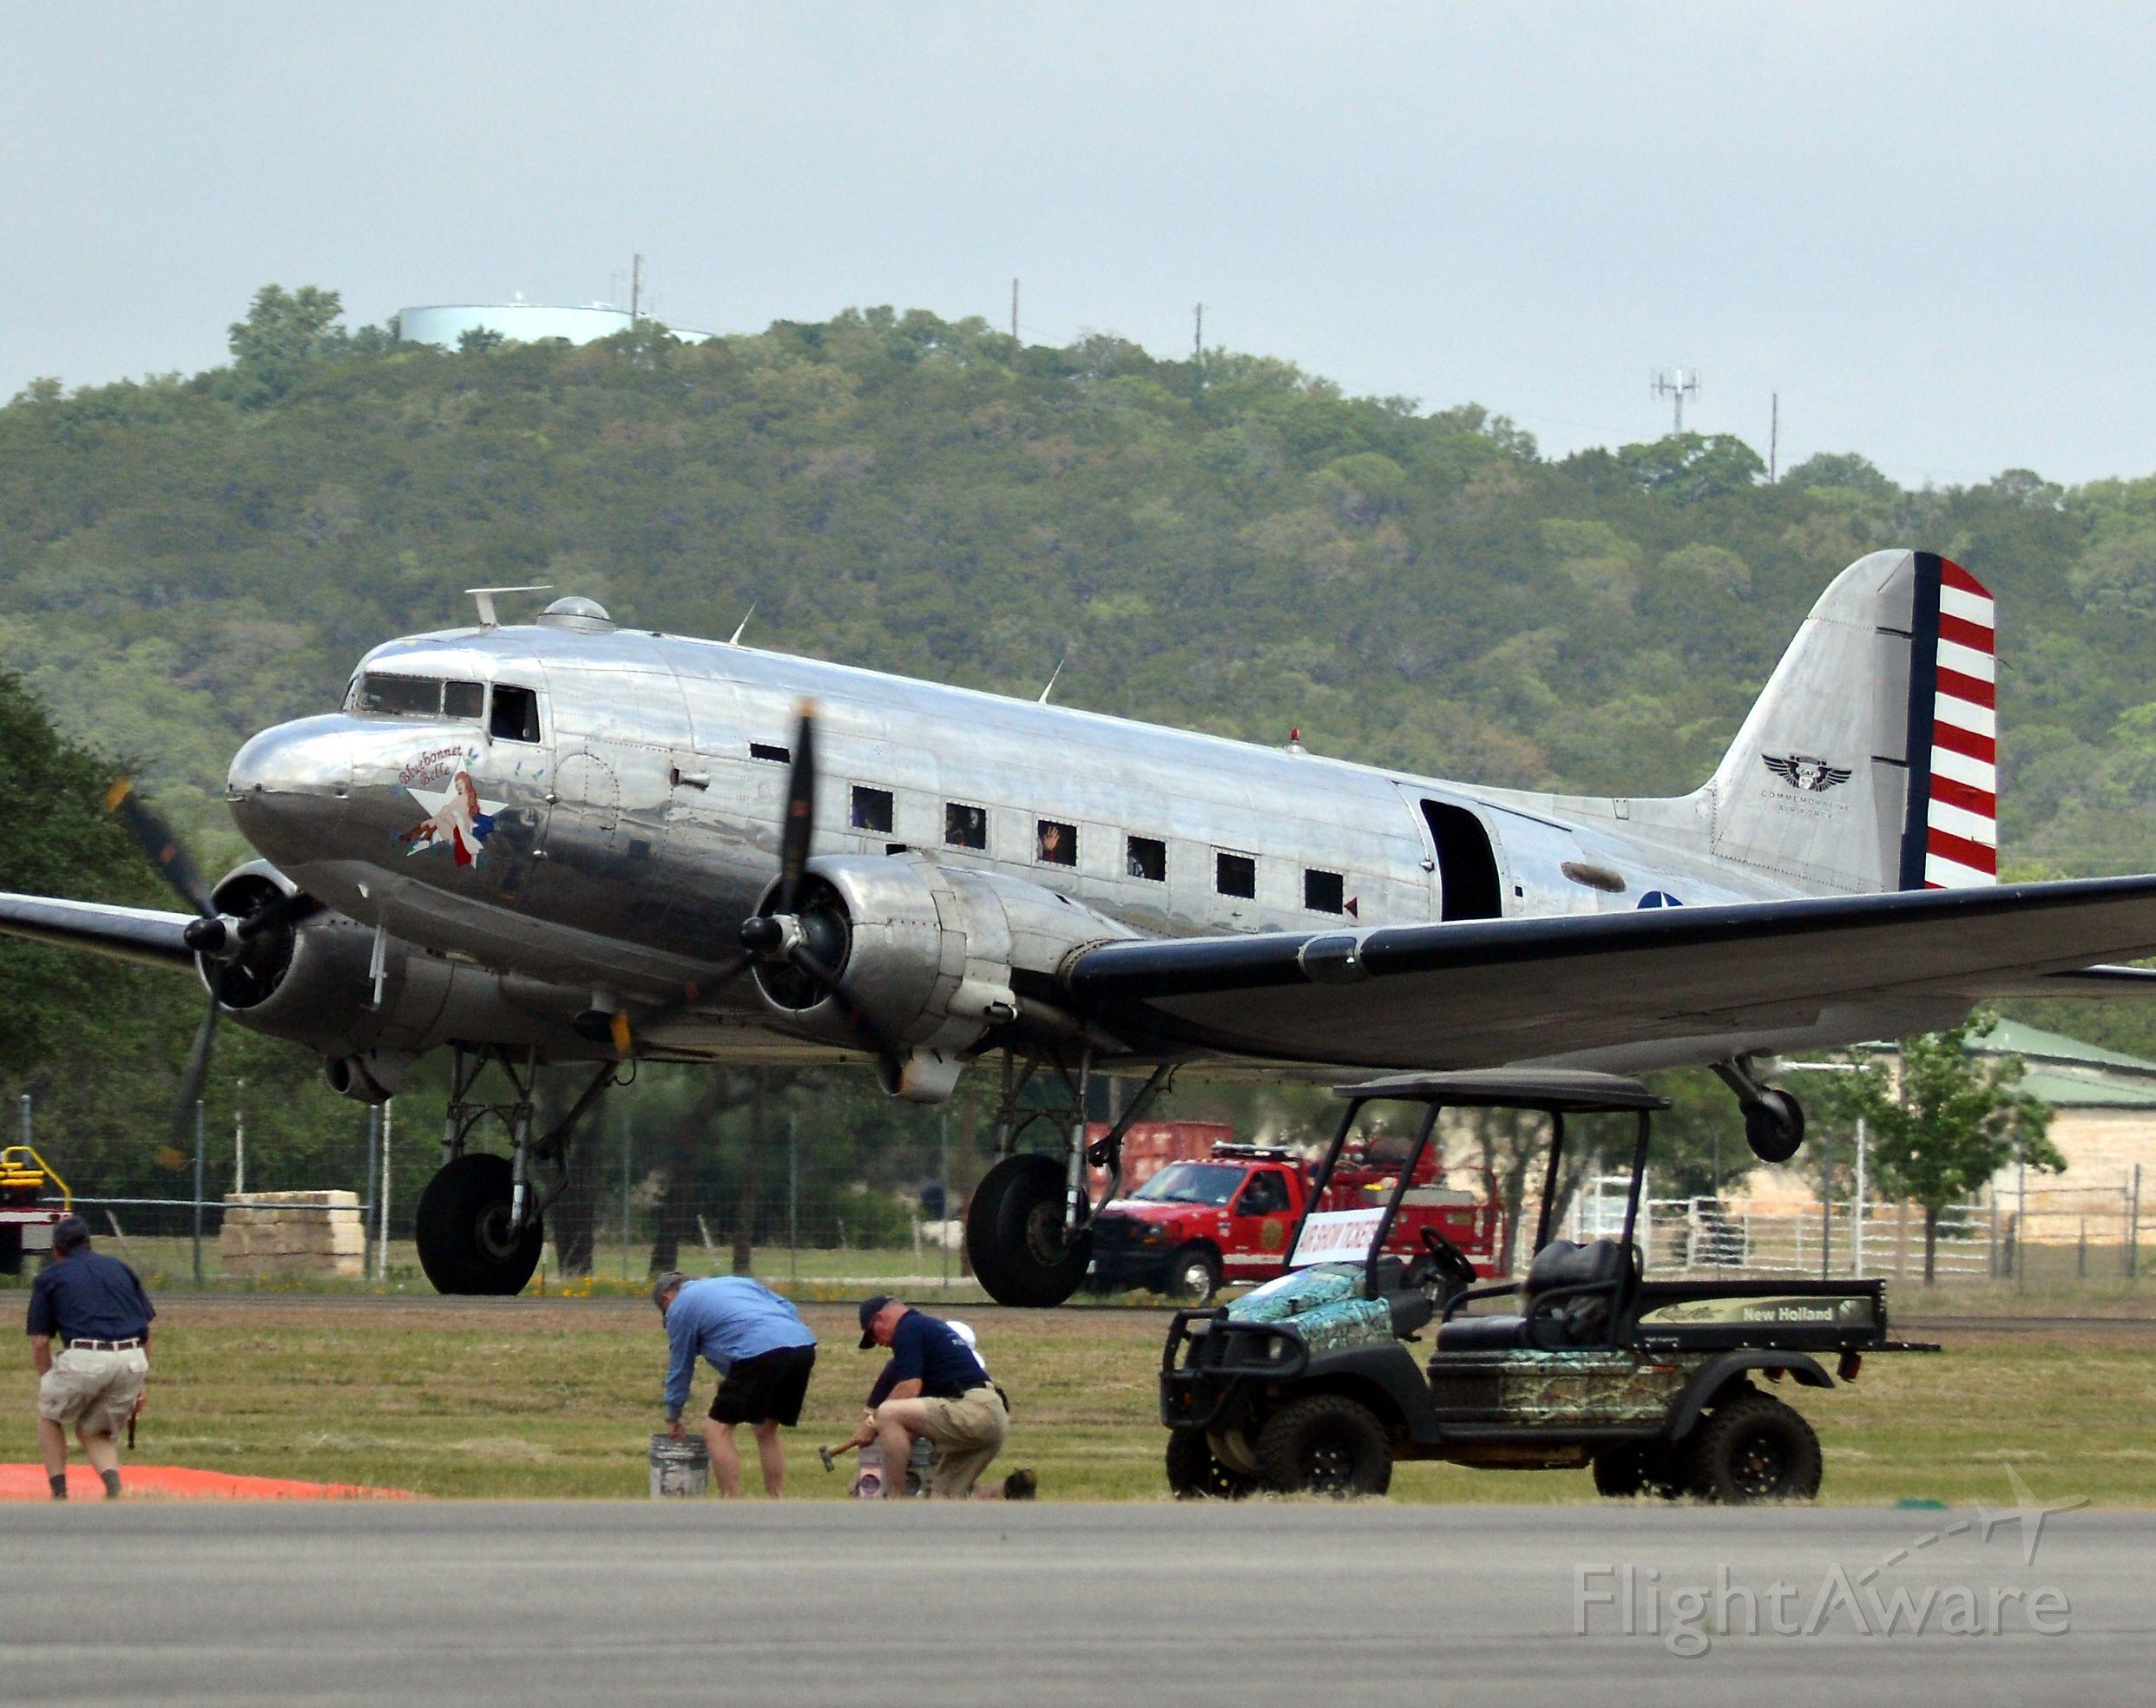 Piper Cheyenne 400 (N47HL) - 1944 c47b at temple tx. airshow.